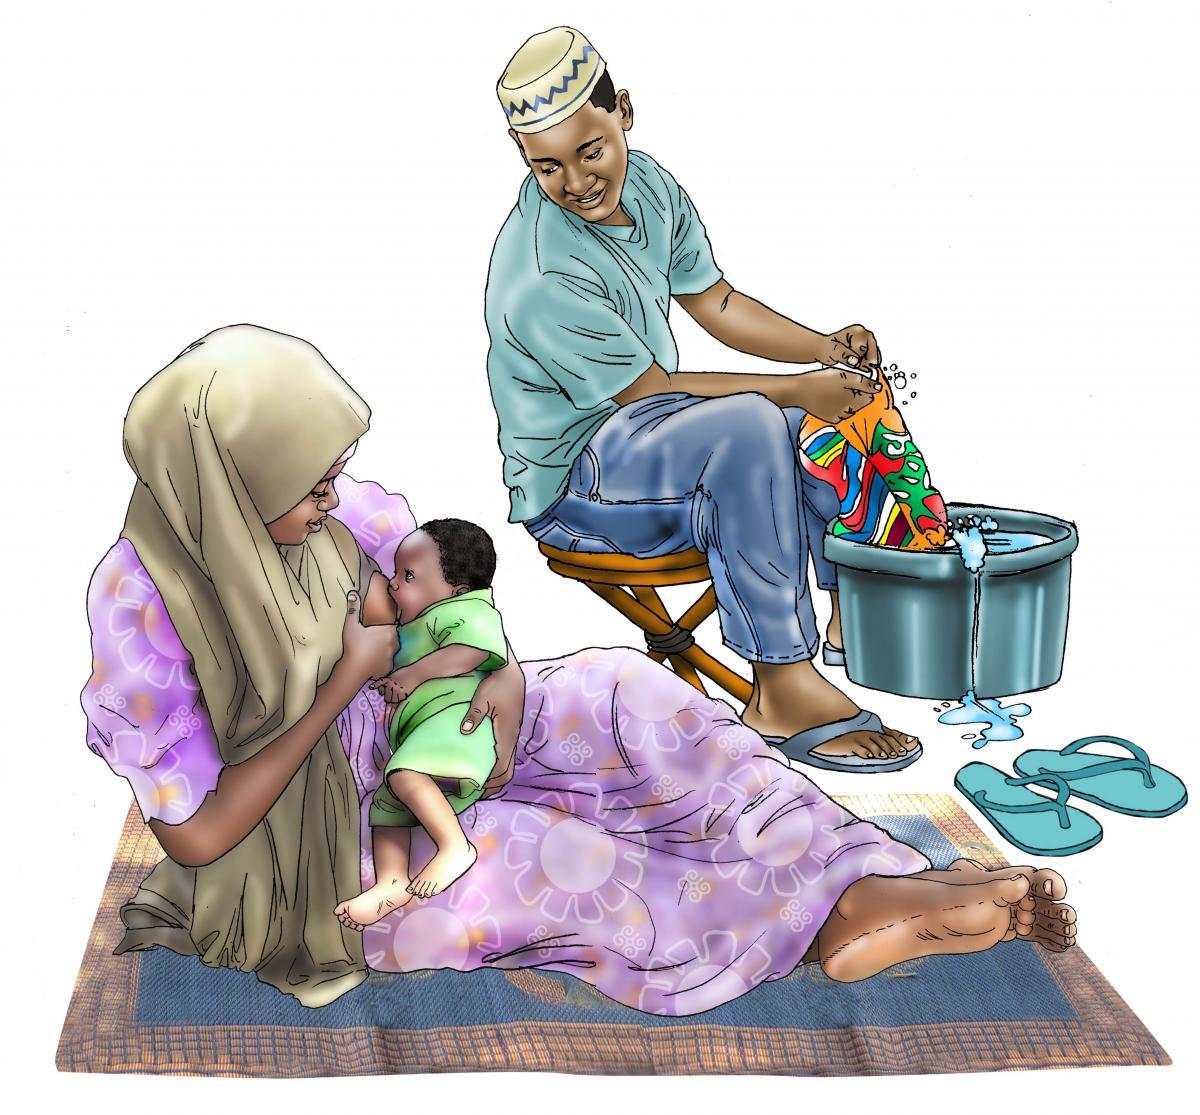 Breastfeeding - Father support for breastfeeding 0-6 mo - 00 - Niger